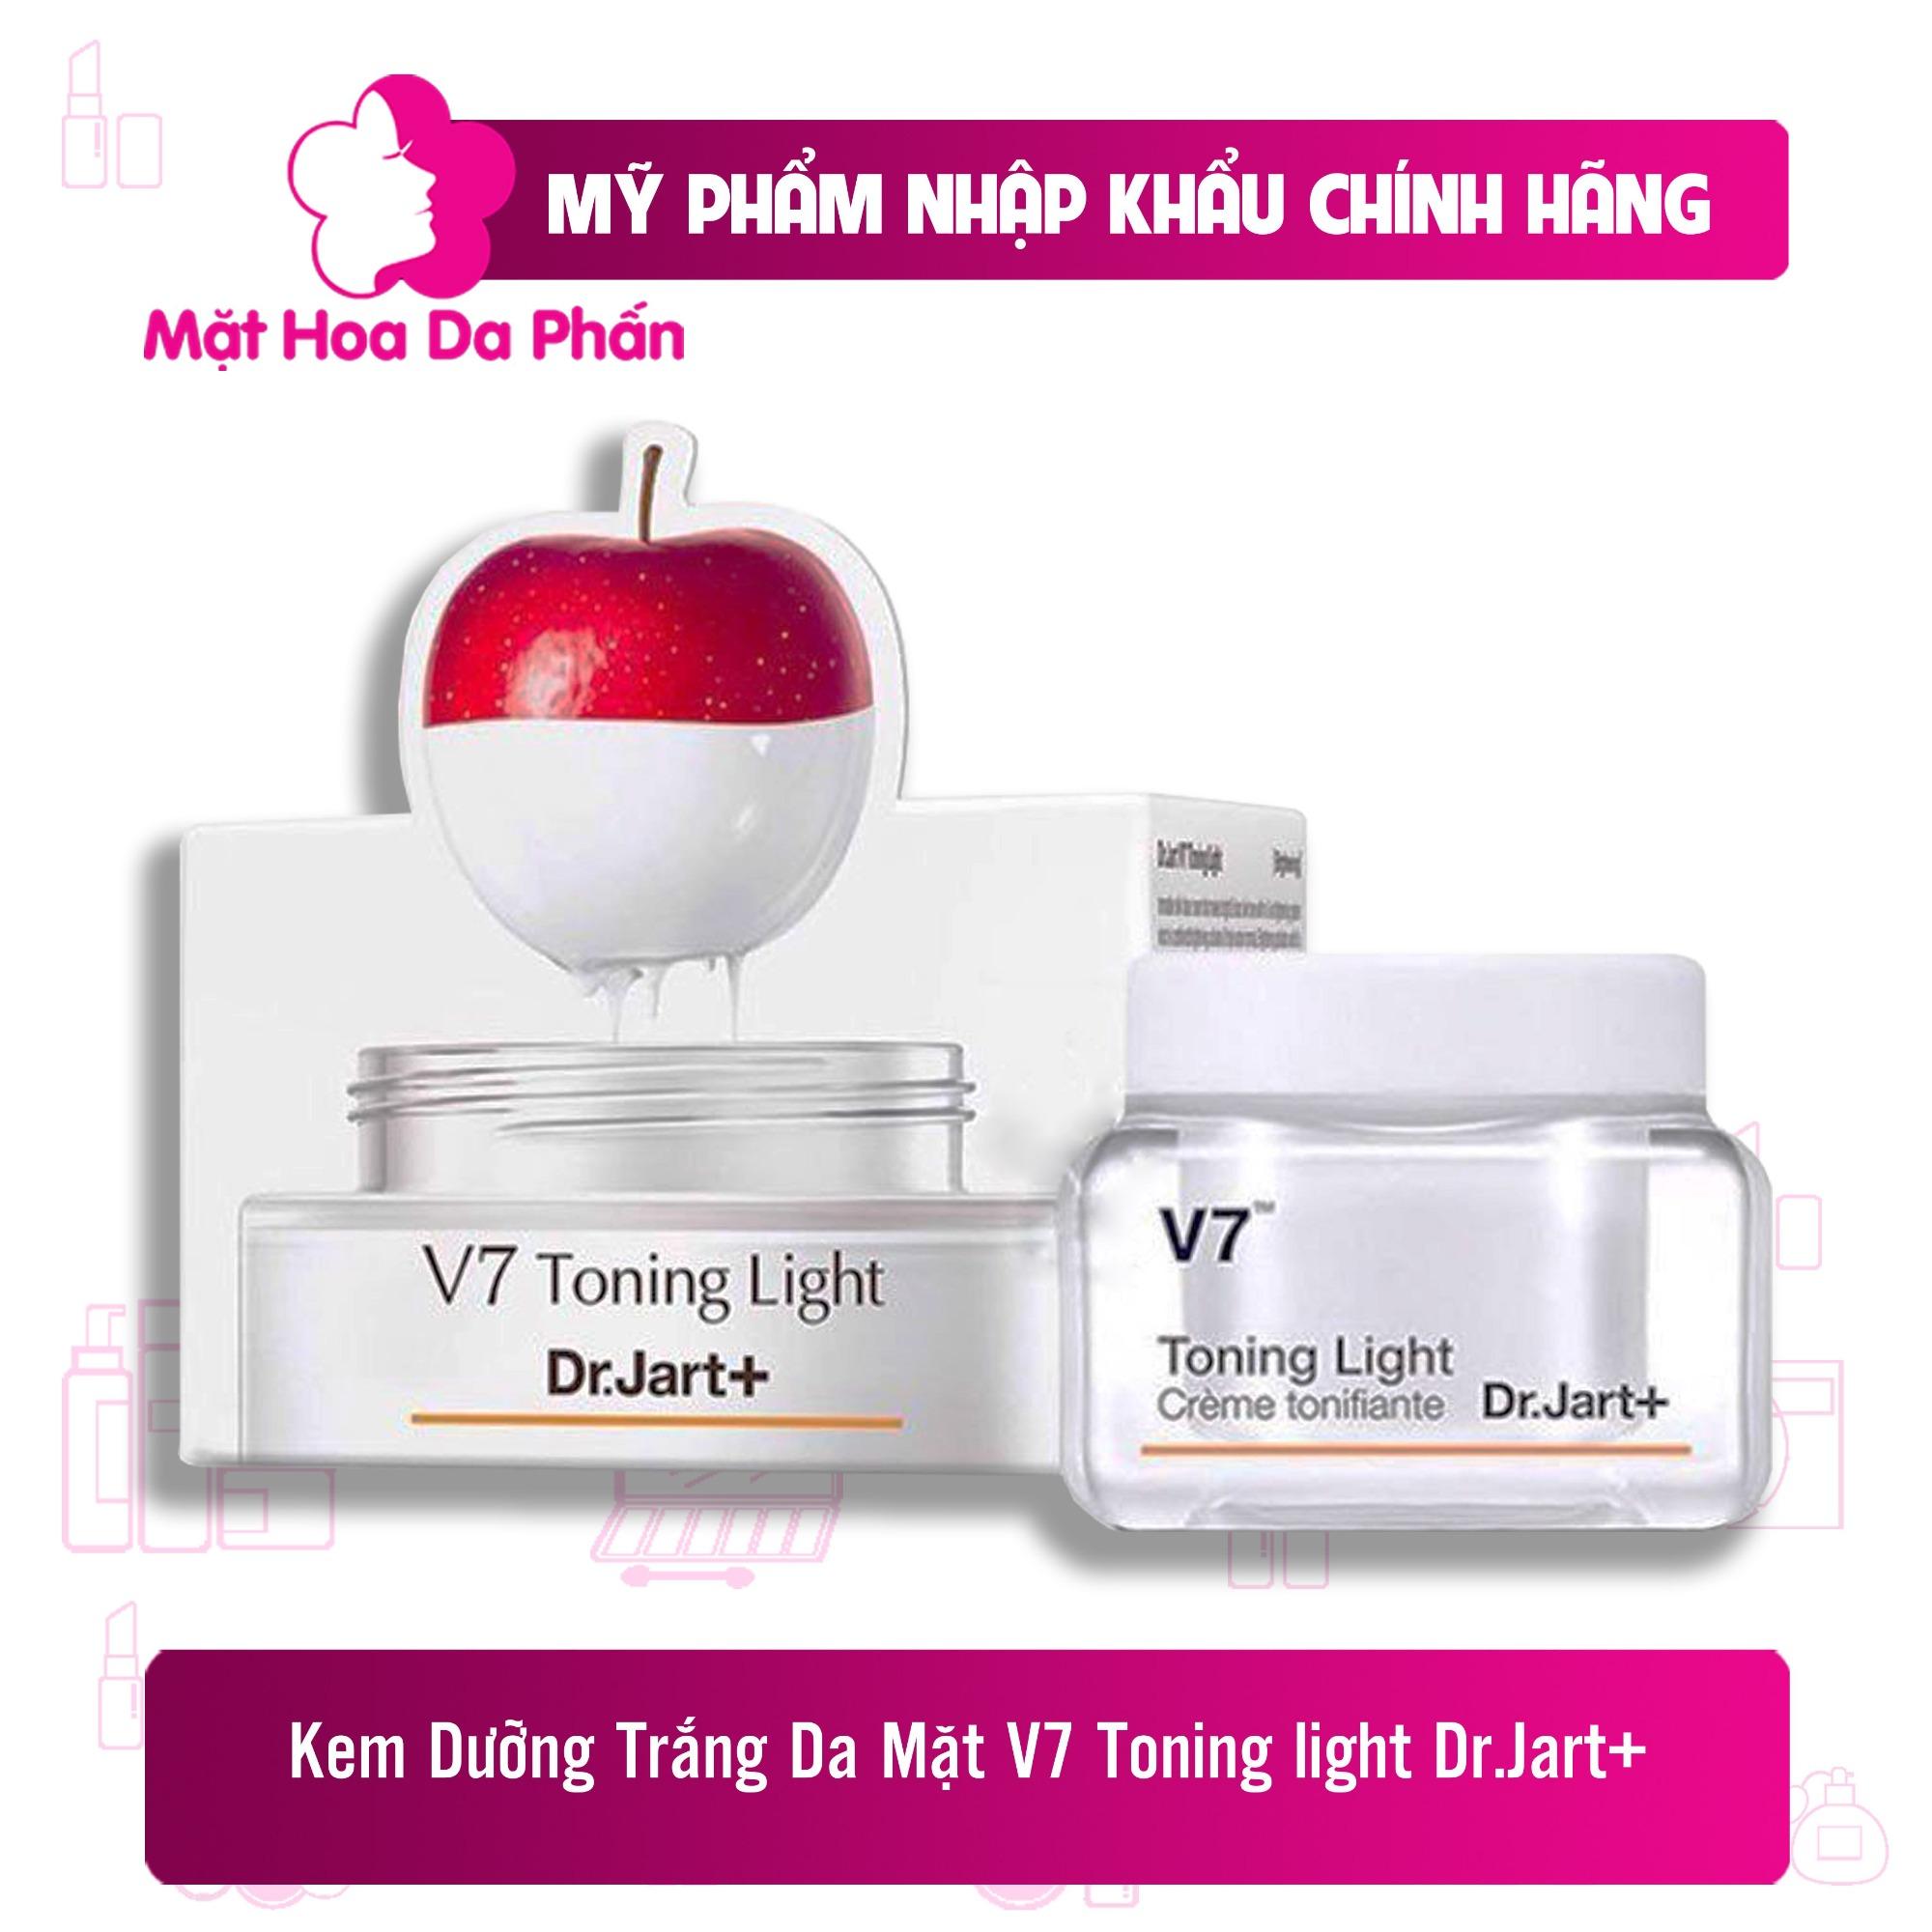 Kem Dưỡng Dr. Jart+ Toning Light V7 15ml